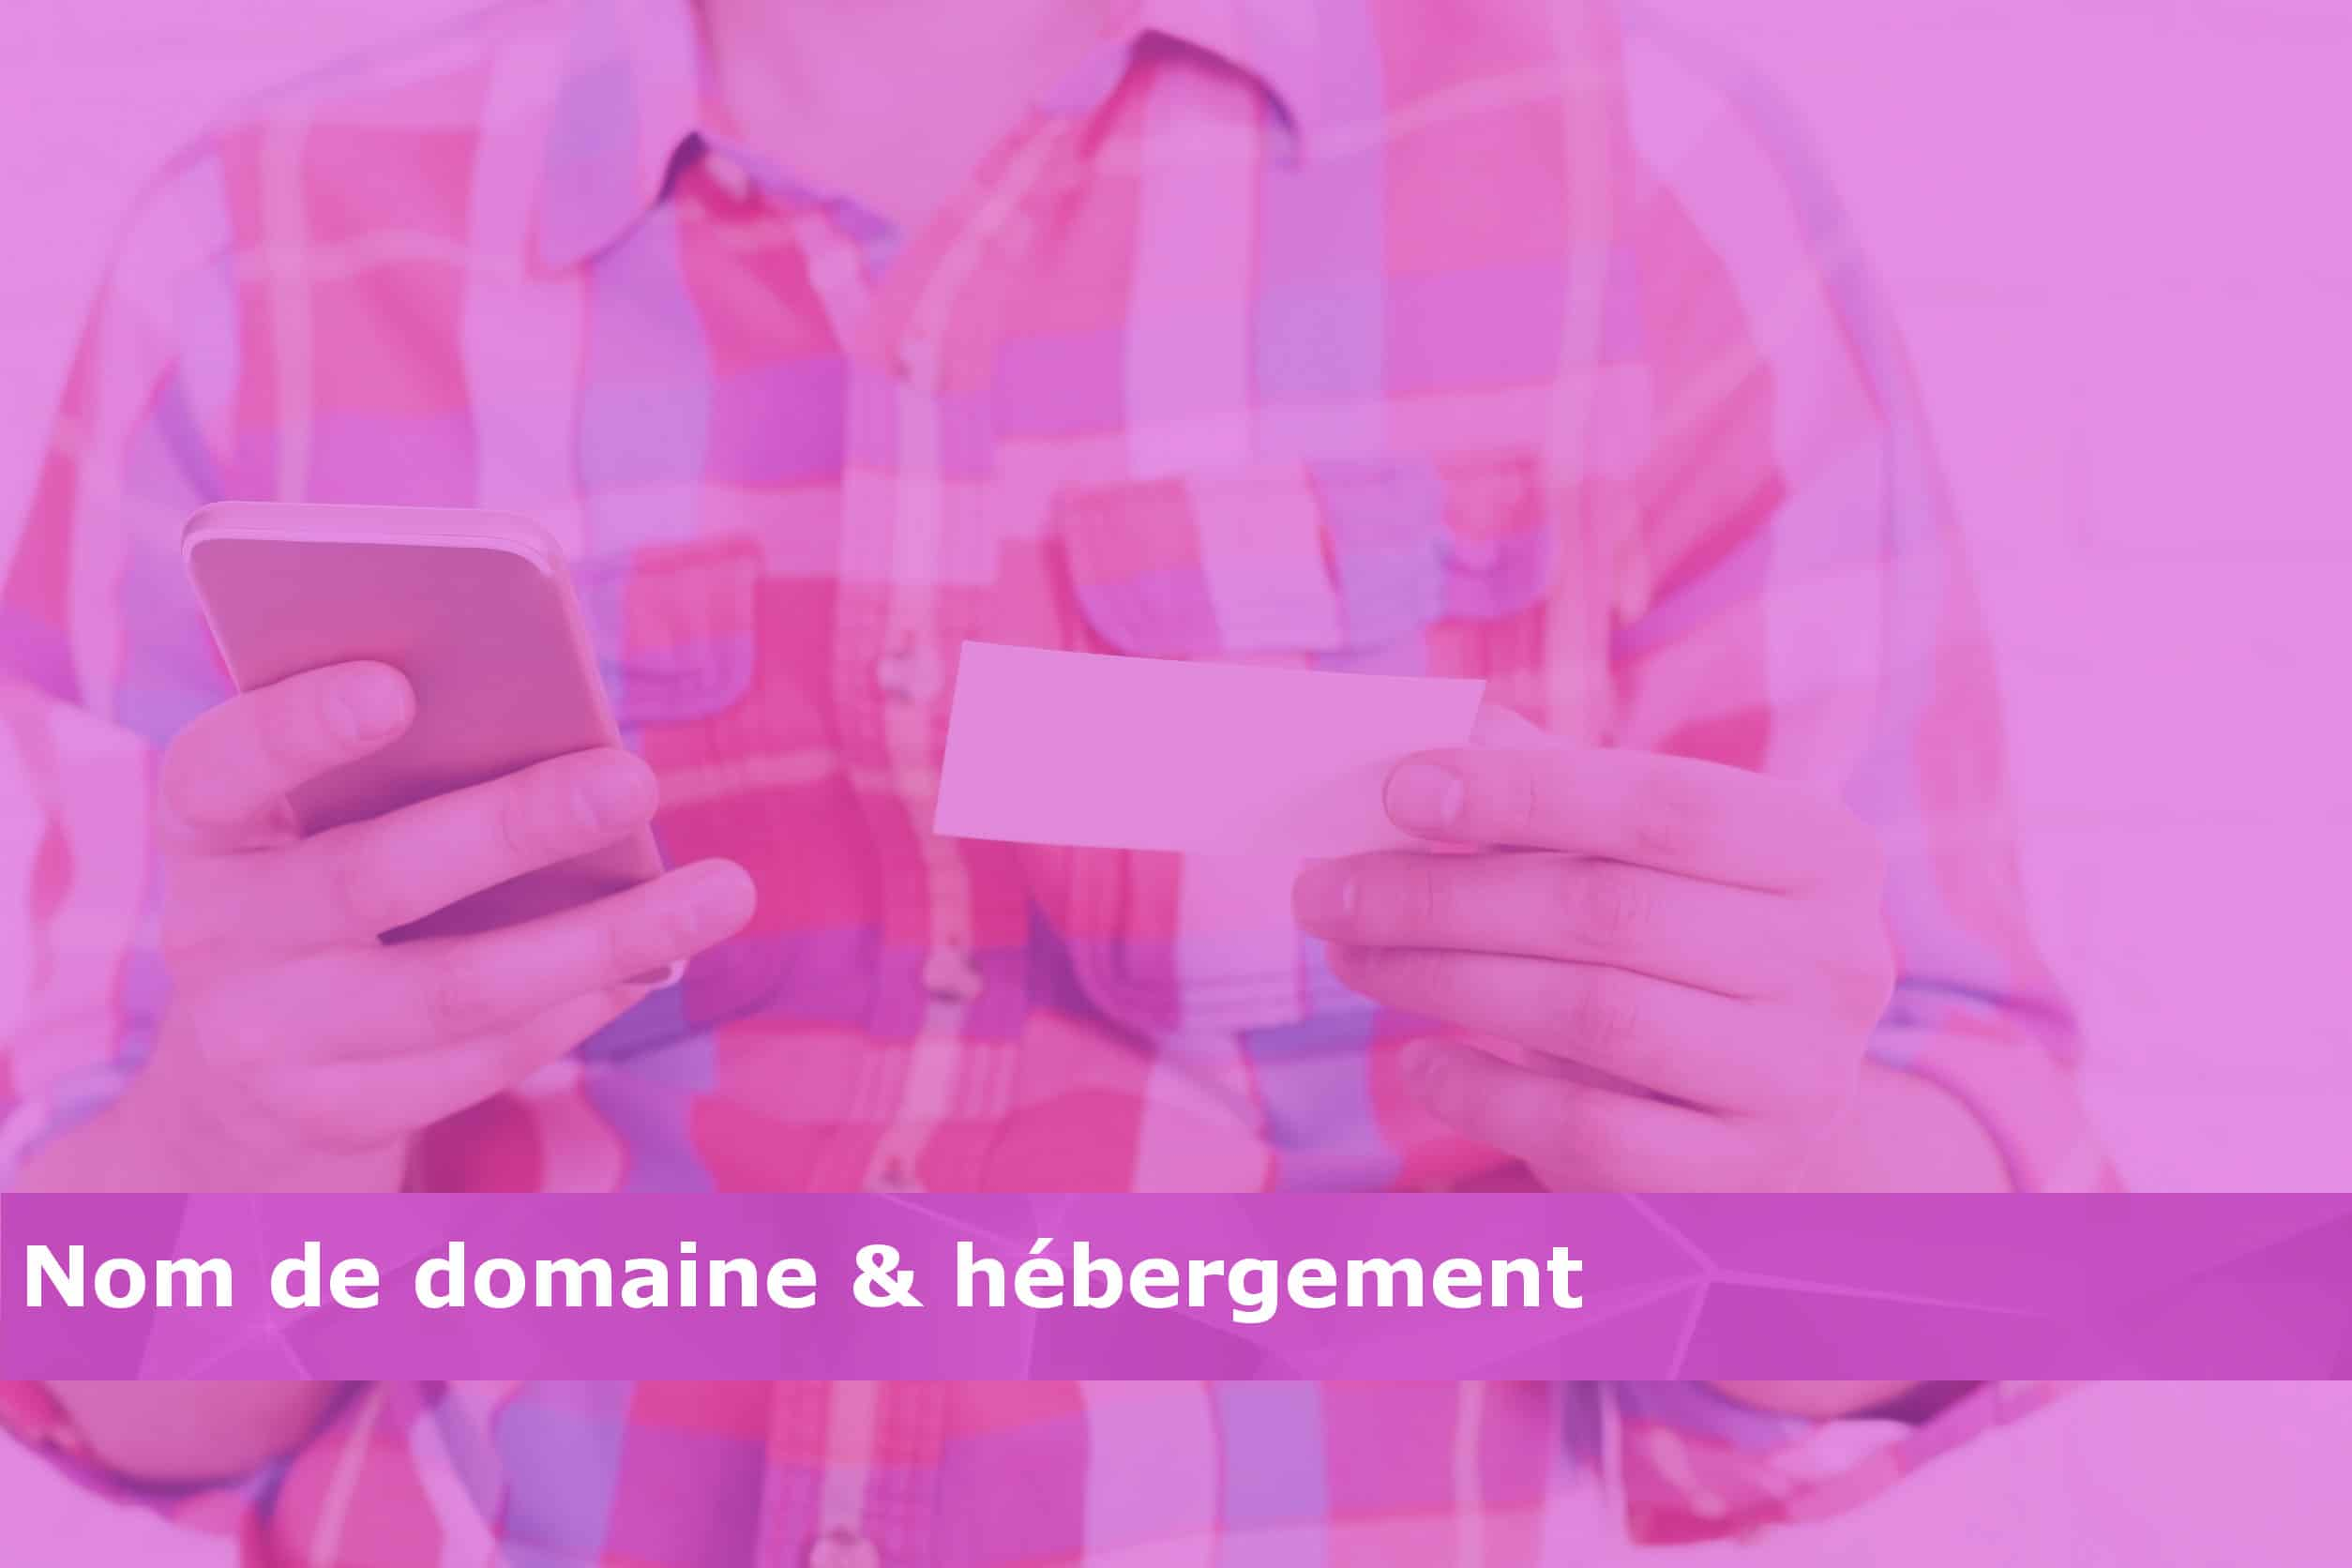 nom-domaine-hebergement-cta-purple